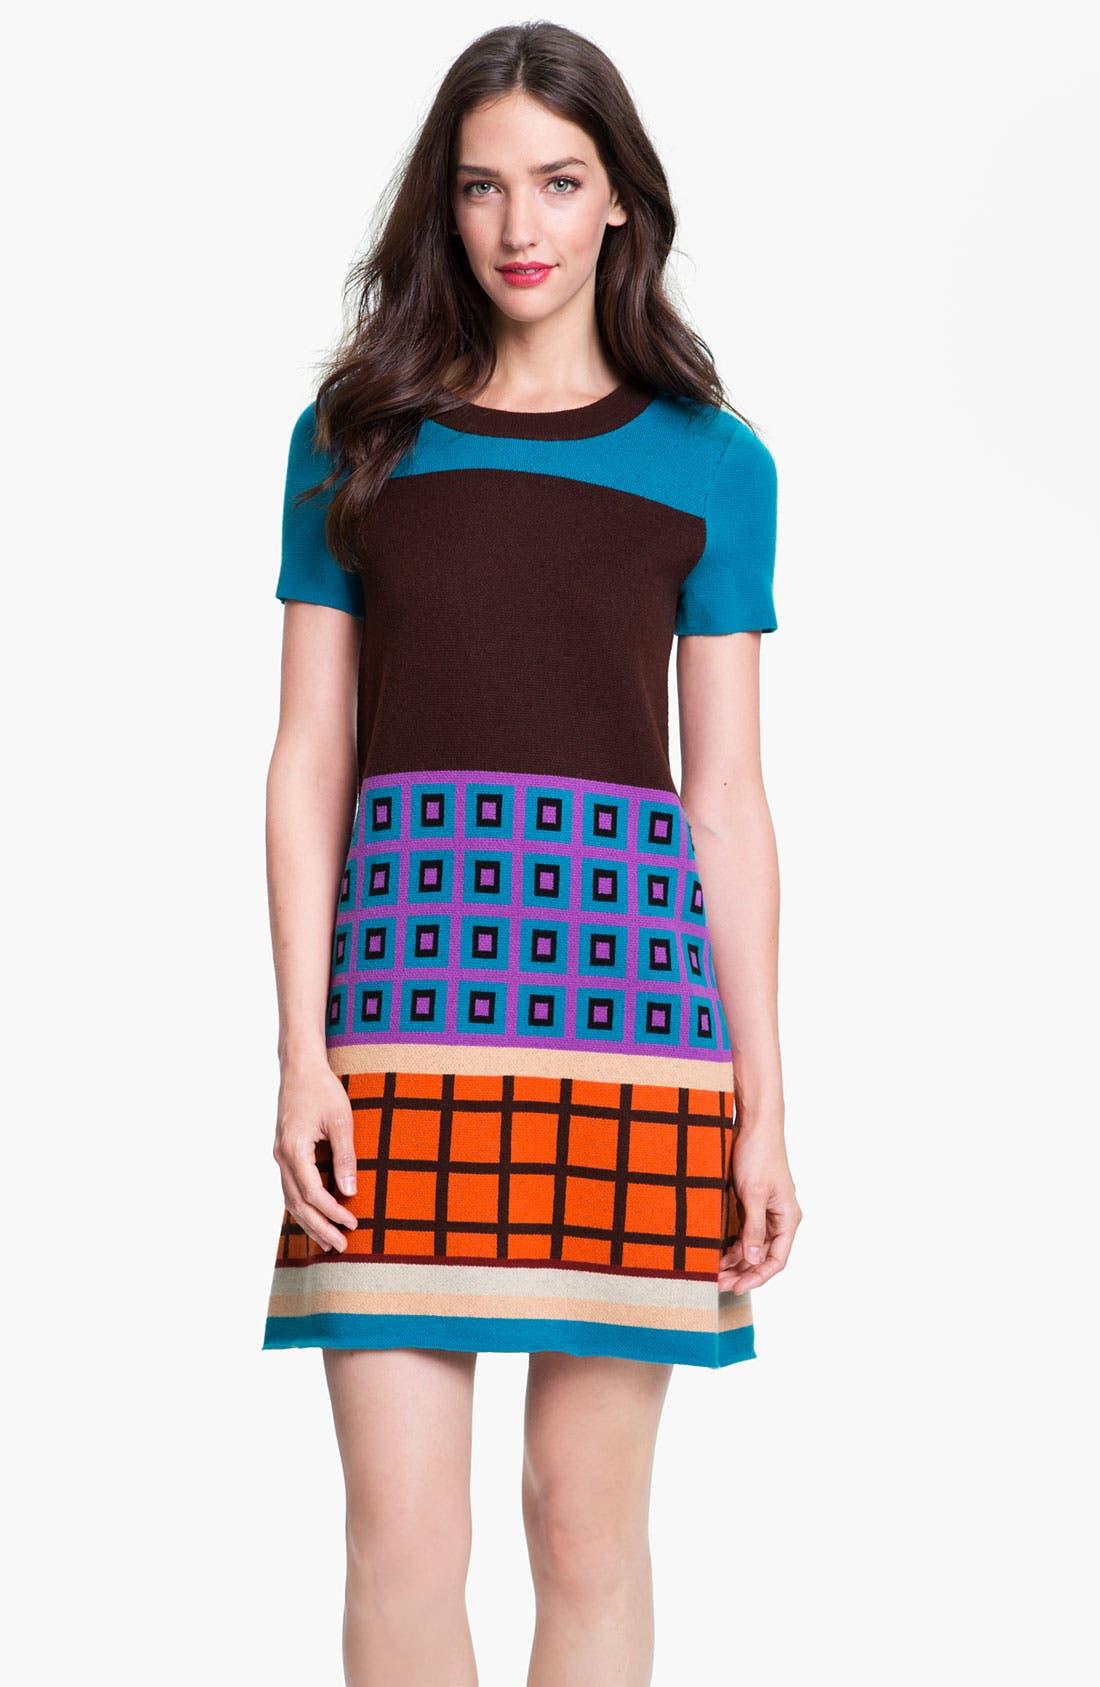 Alternate Image 1 Selected - kate spade new york 'freyda' wool blend sweater shift dress